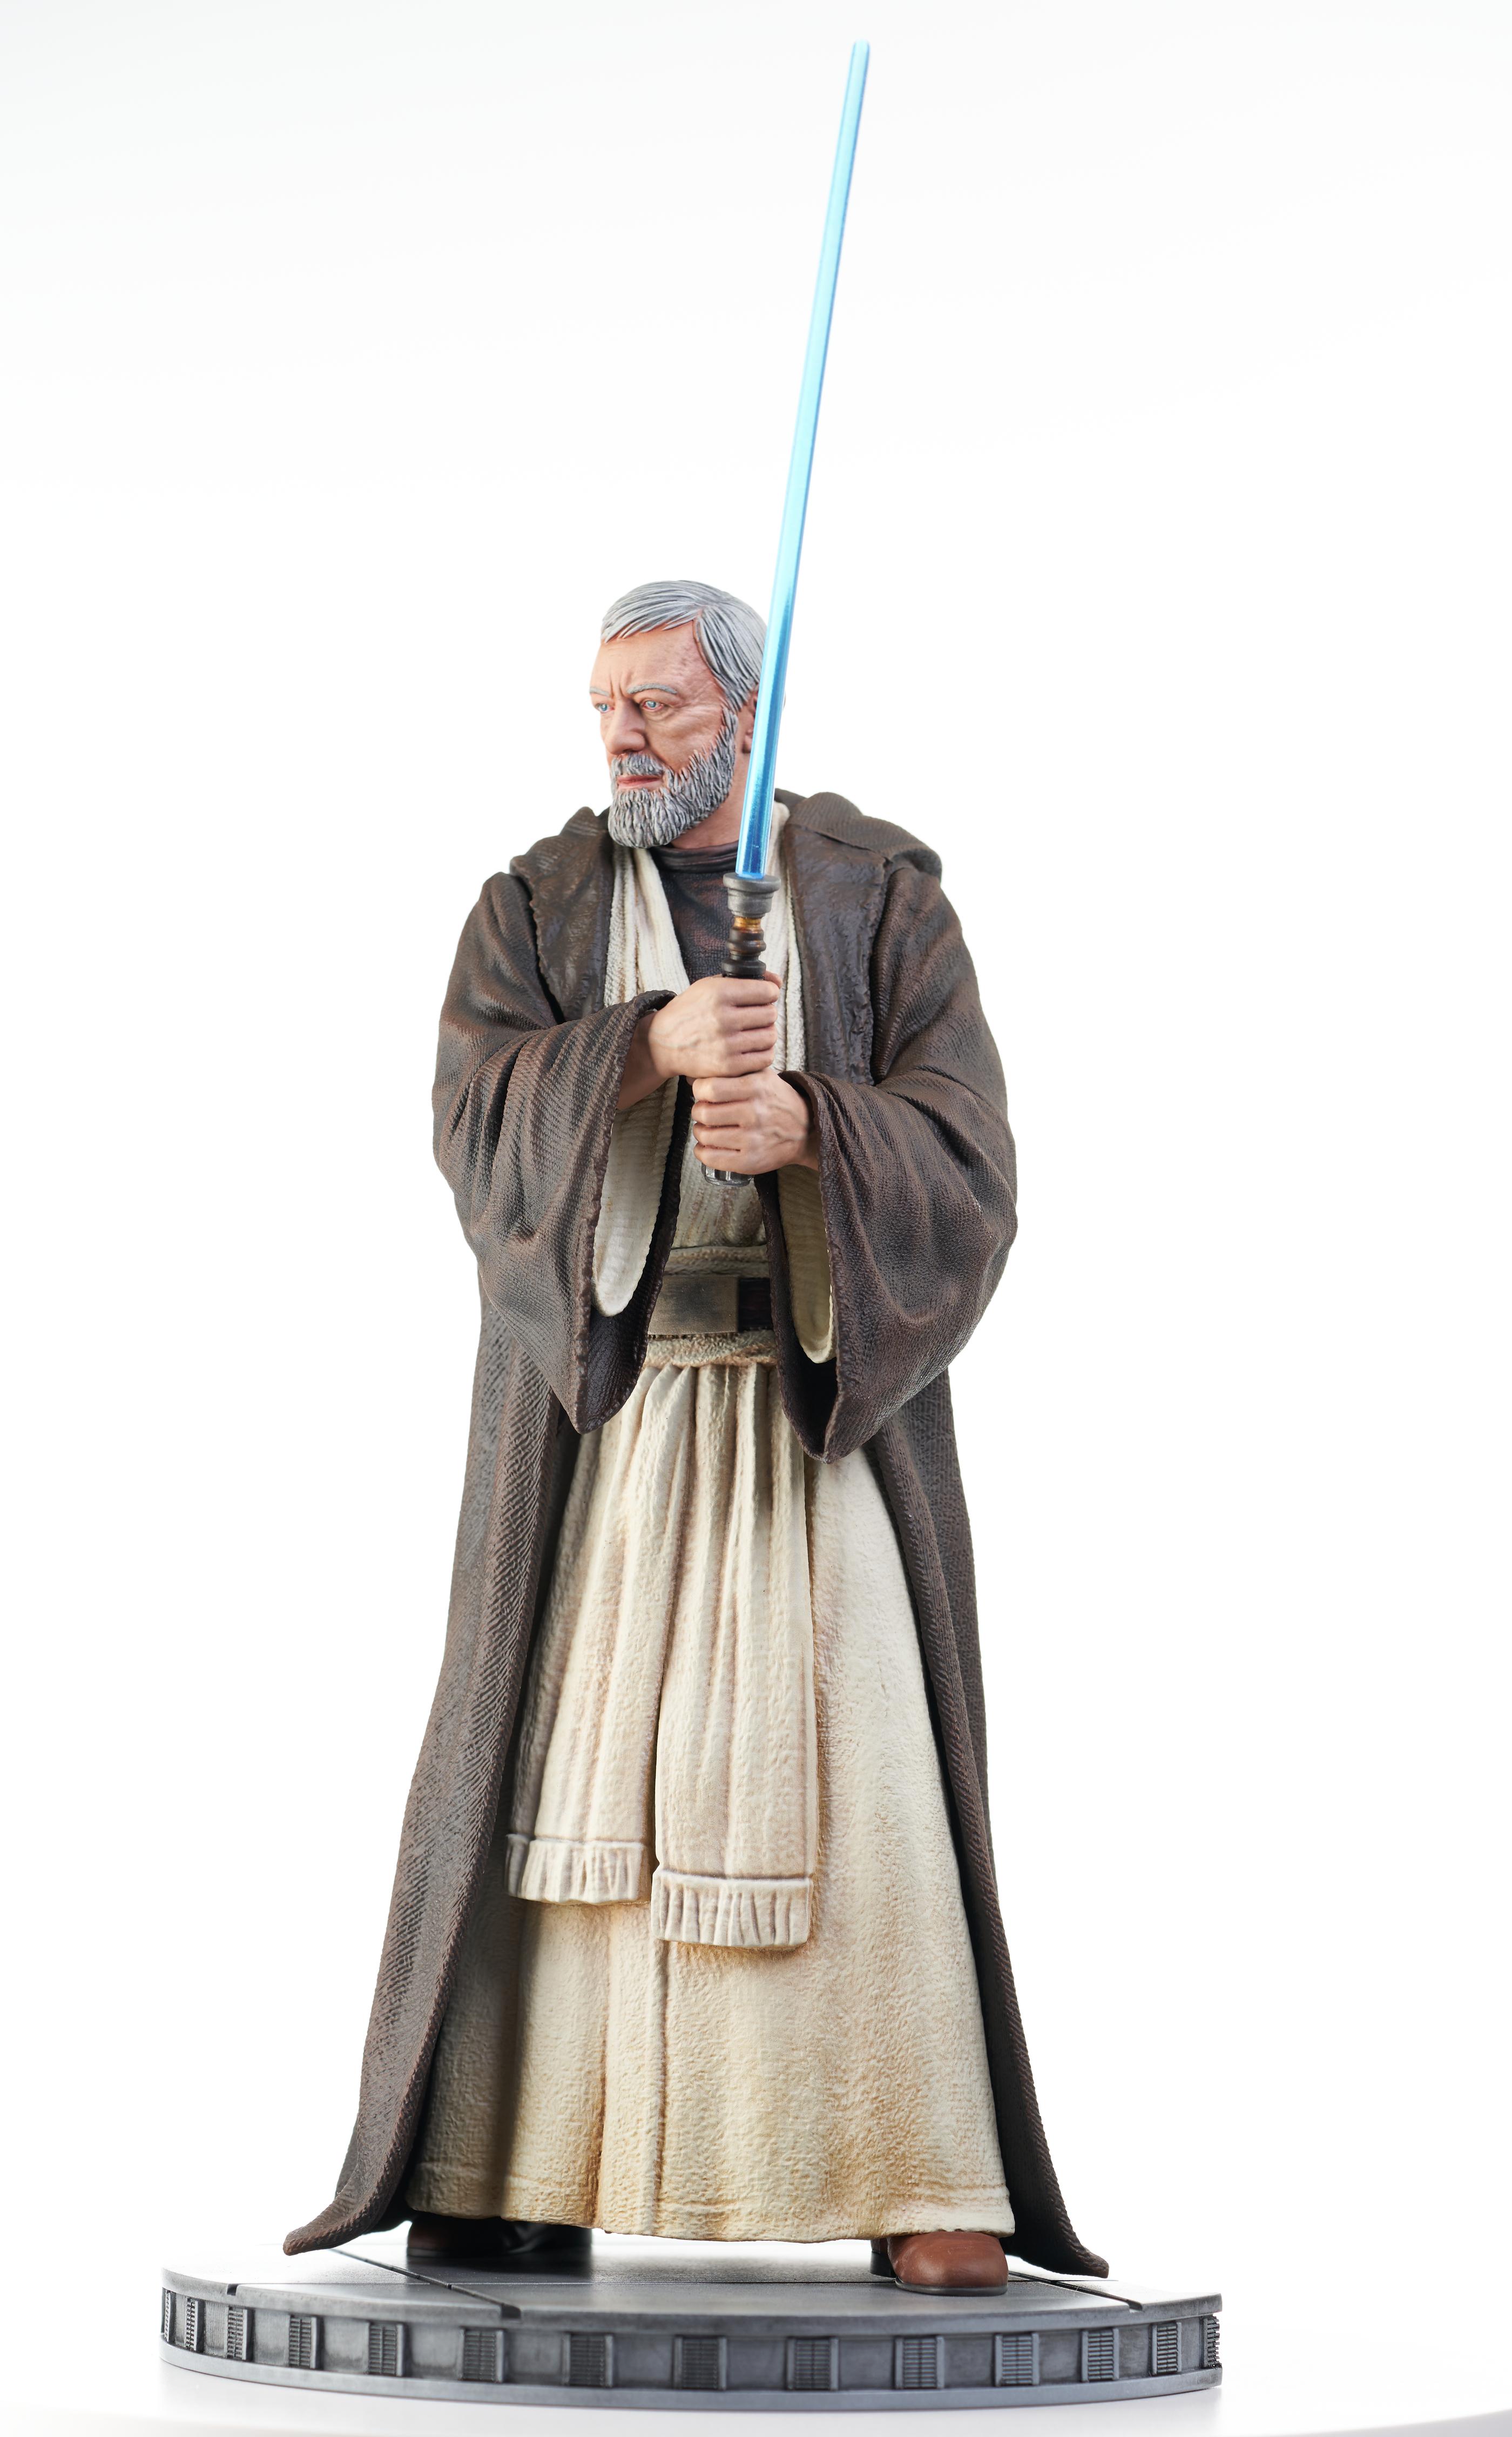 Star Wars Milestones - A New Hope Ben Kenobi Statue